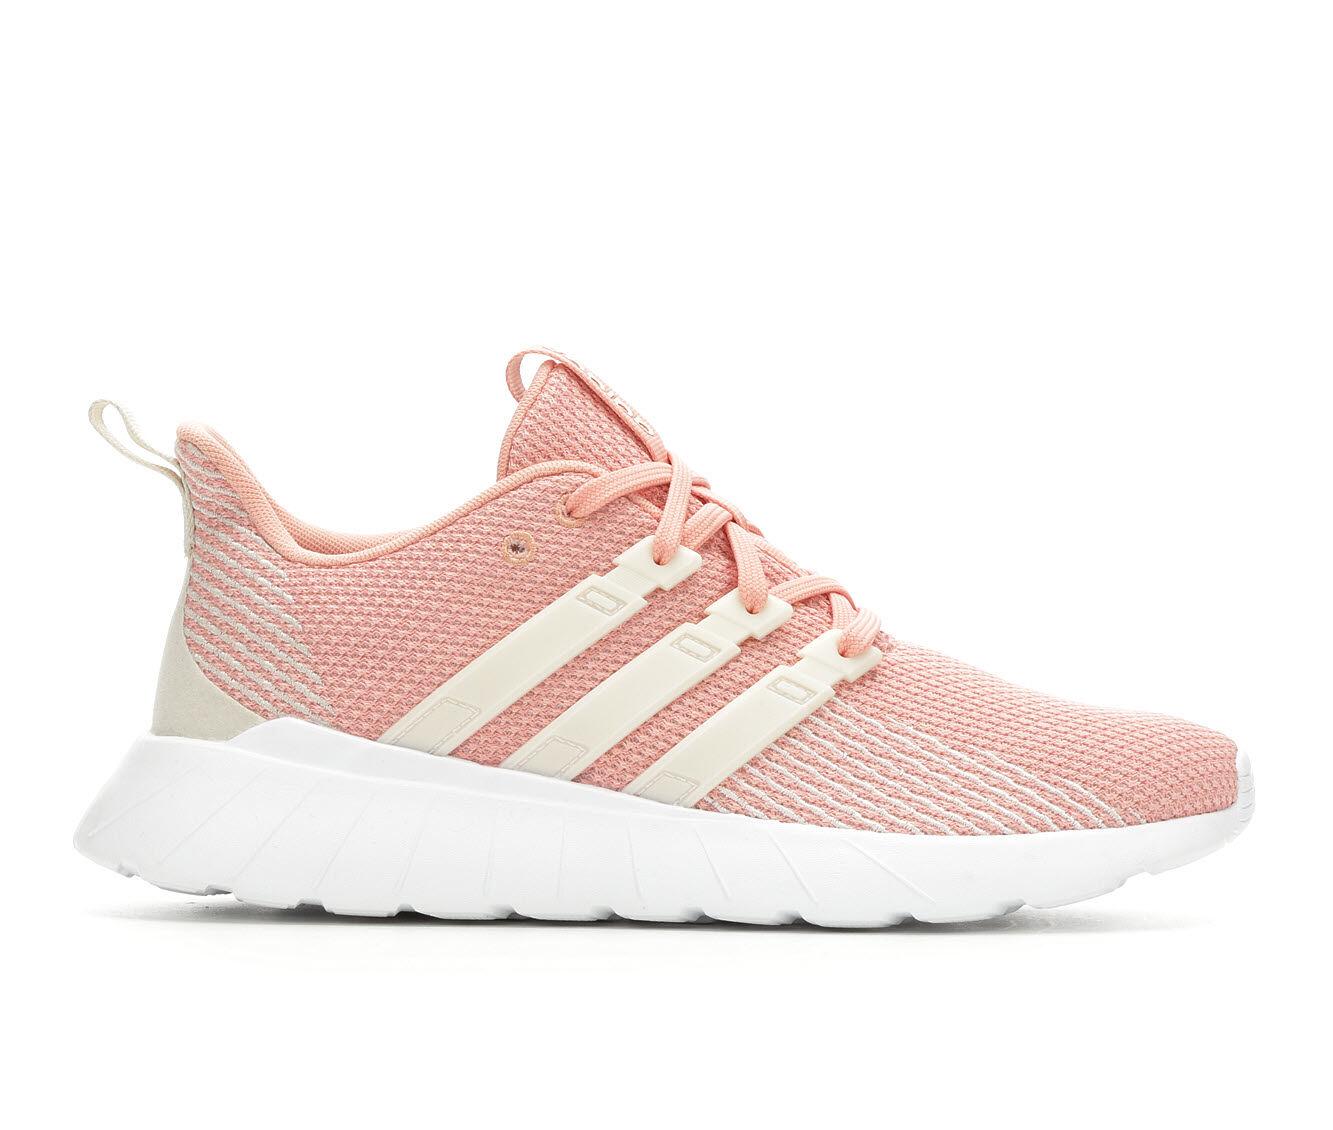 Women's Adidas Questar Flow Sneakers Dust Pink/White